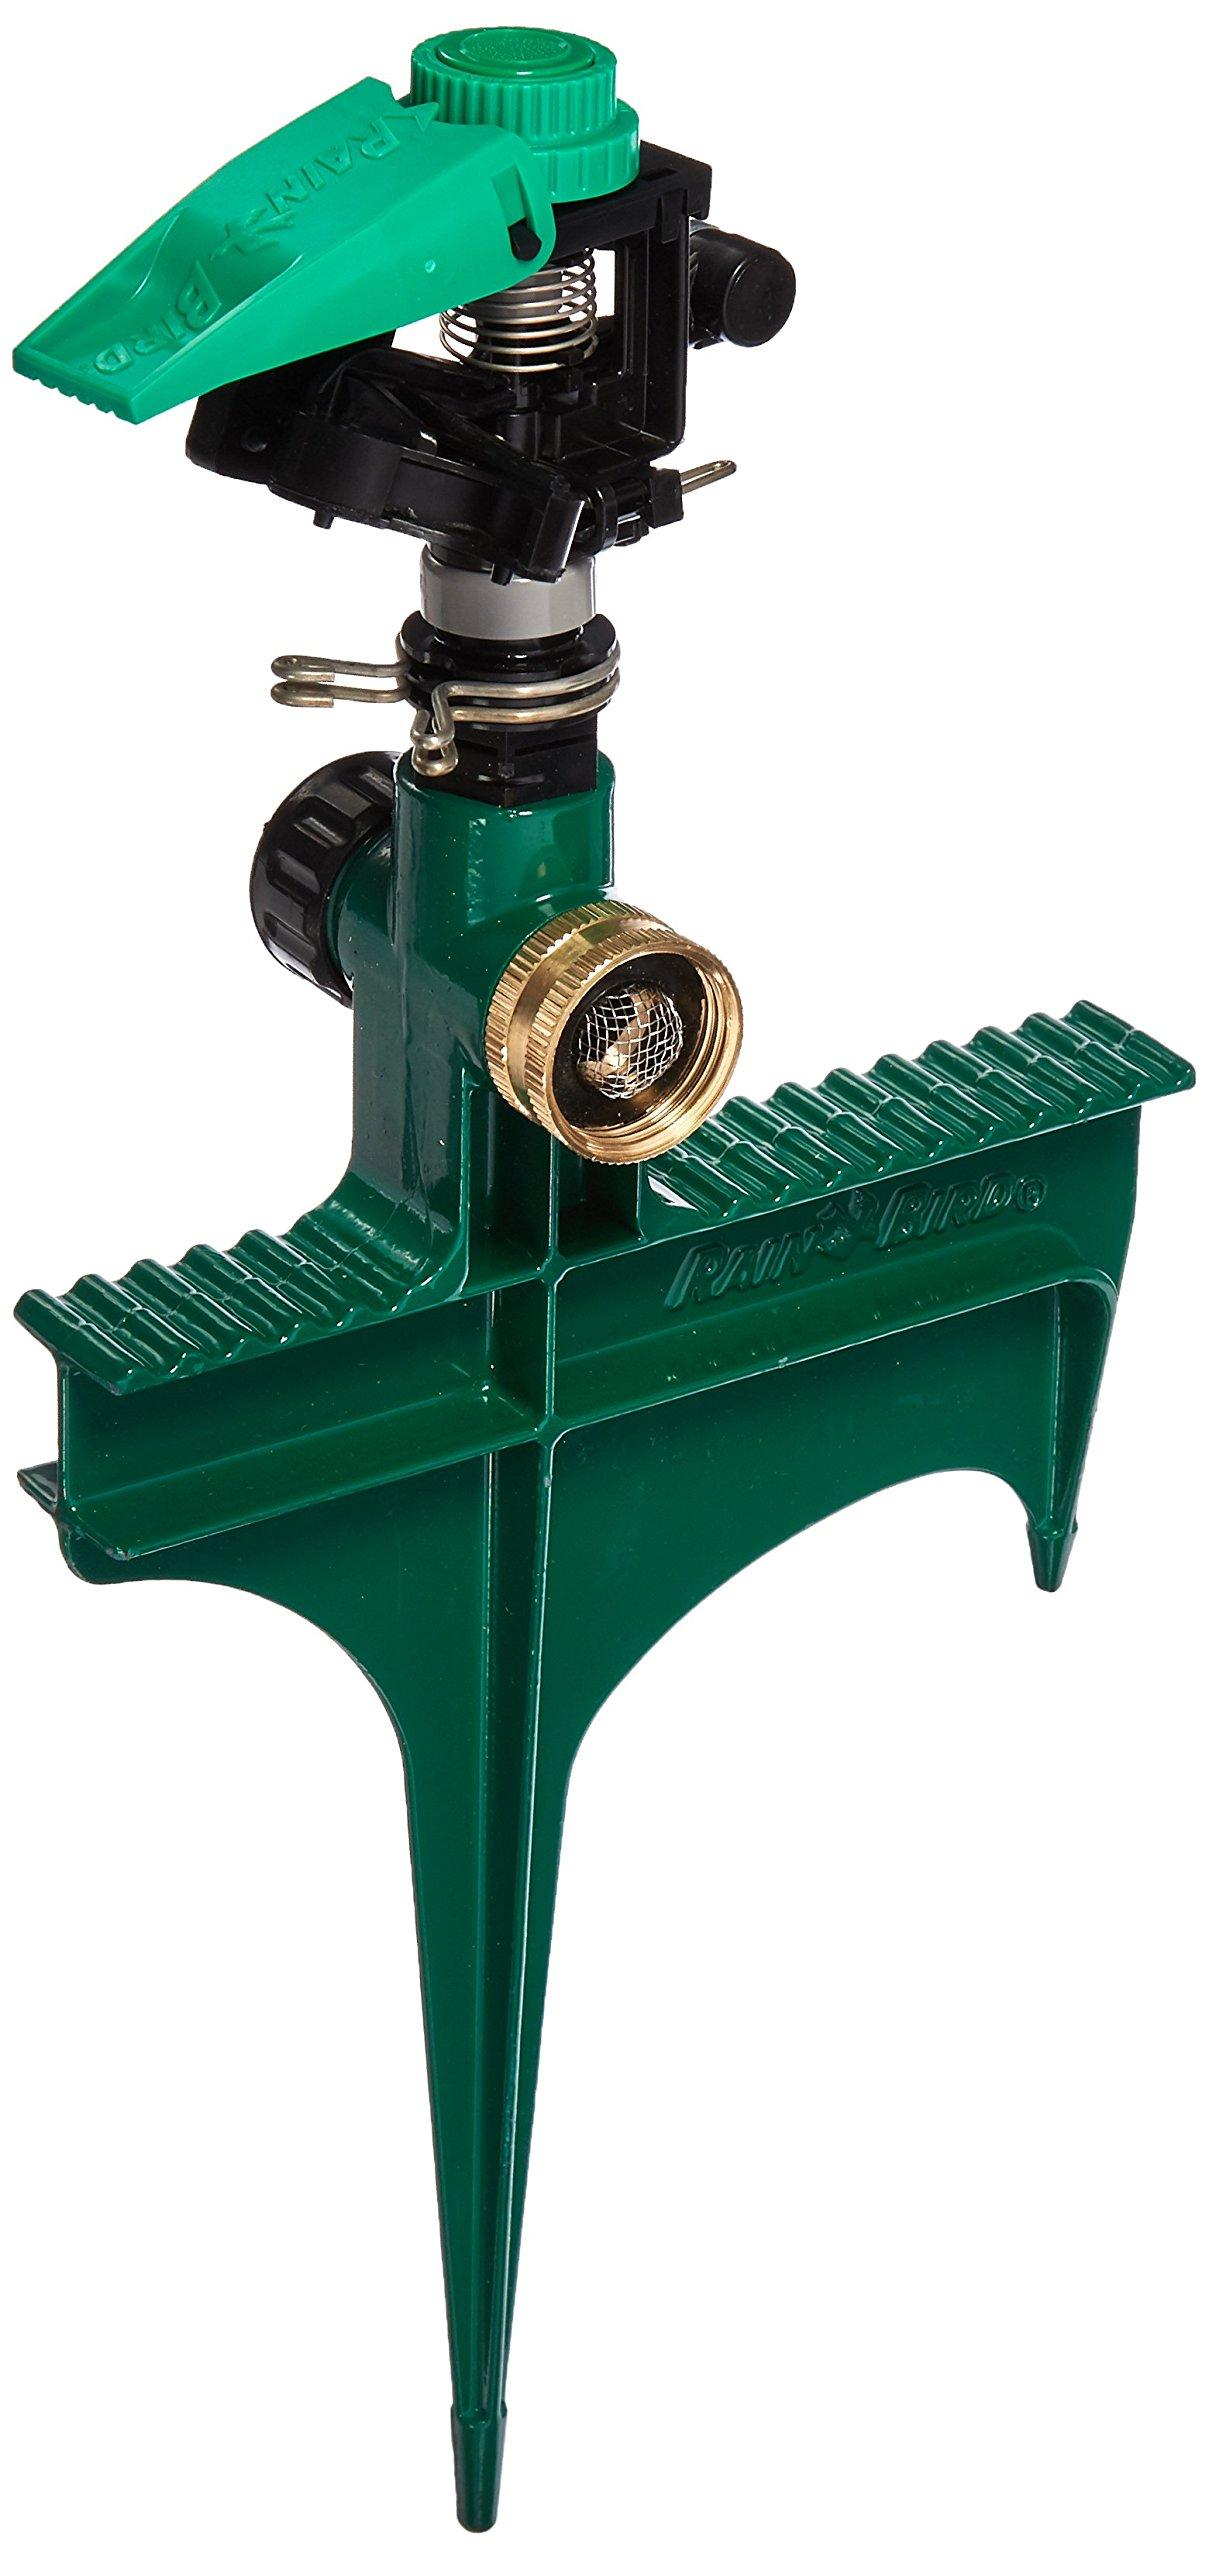 Rain Bird P5RLSP Plastic Impact Sprinkler on Large Metal Spike, Adjustable 0° - 360° Pattern, 25' - 41' Spray Distance